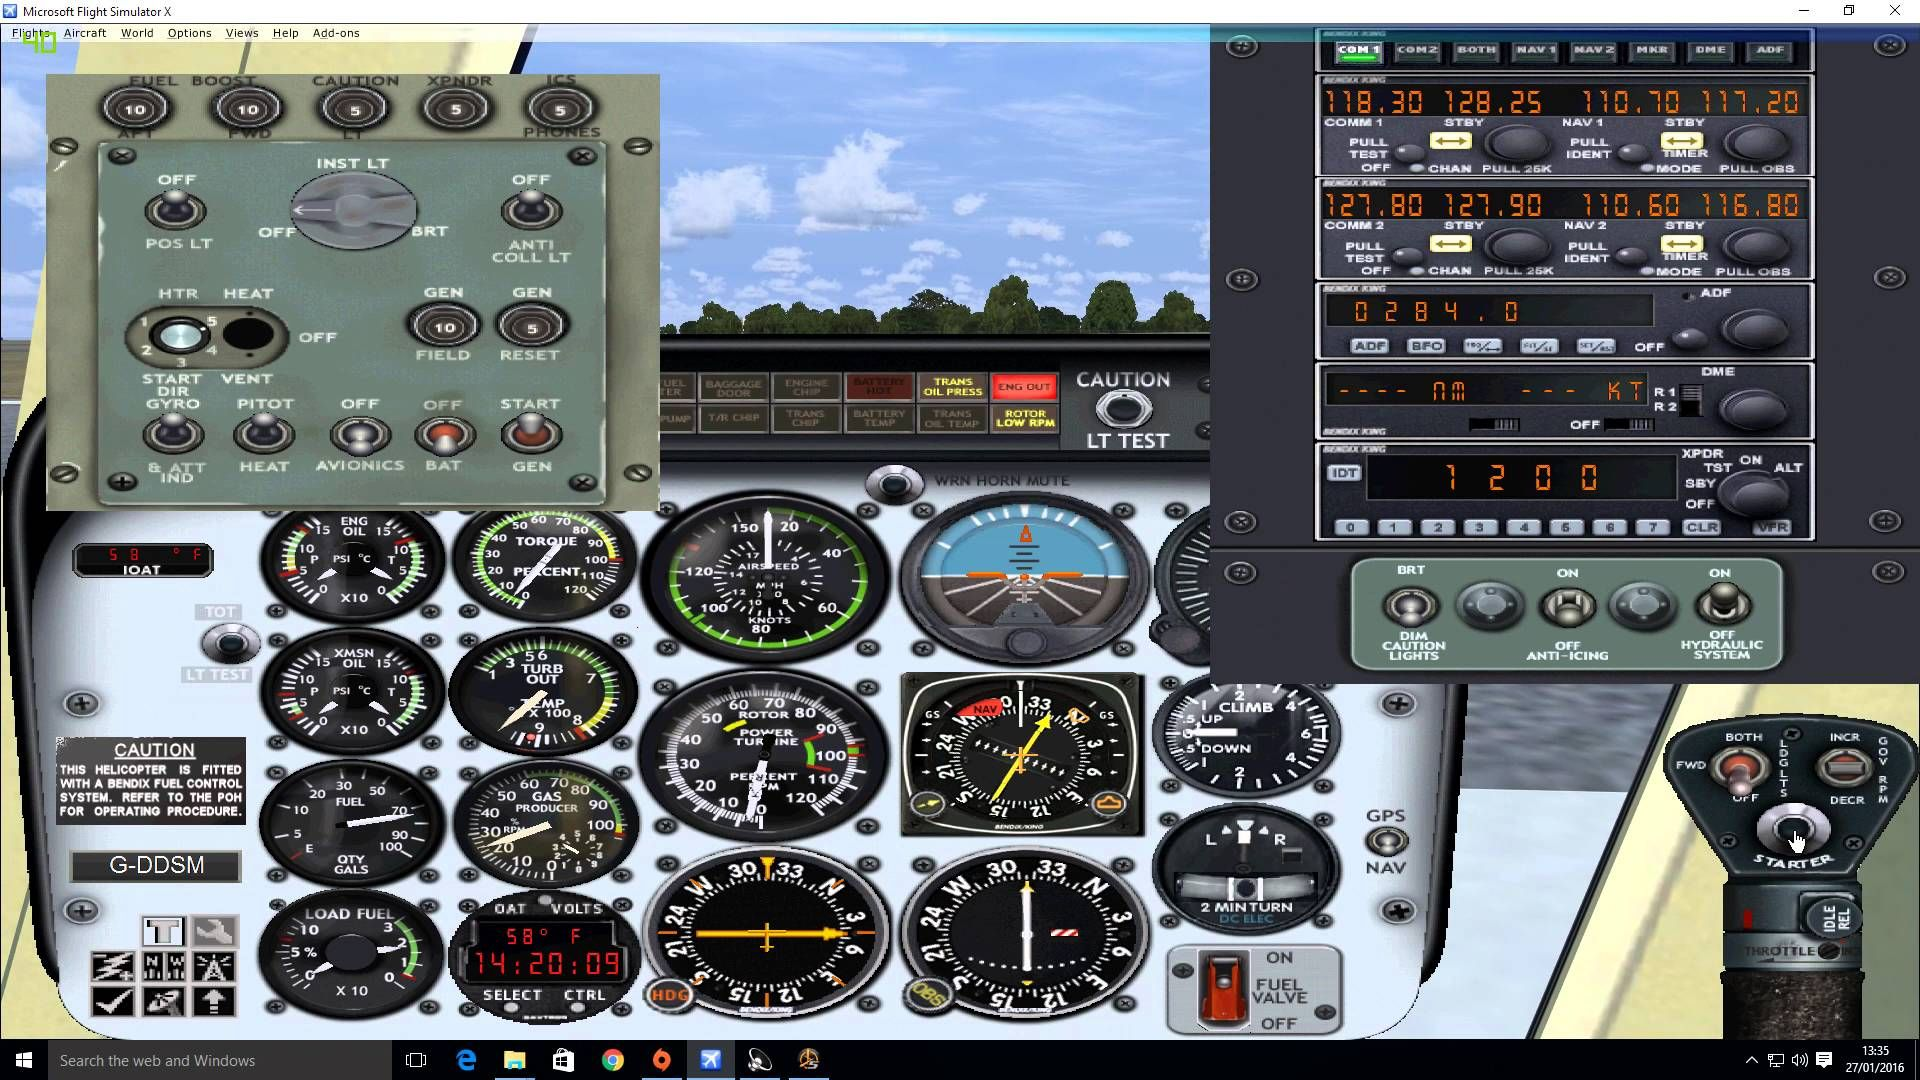 FSX Dodsim Bell 206 Helicopter Startup Tutorial Made Easy